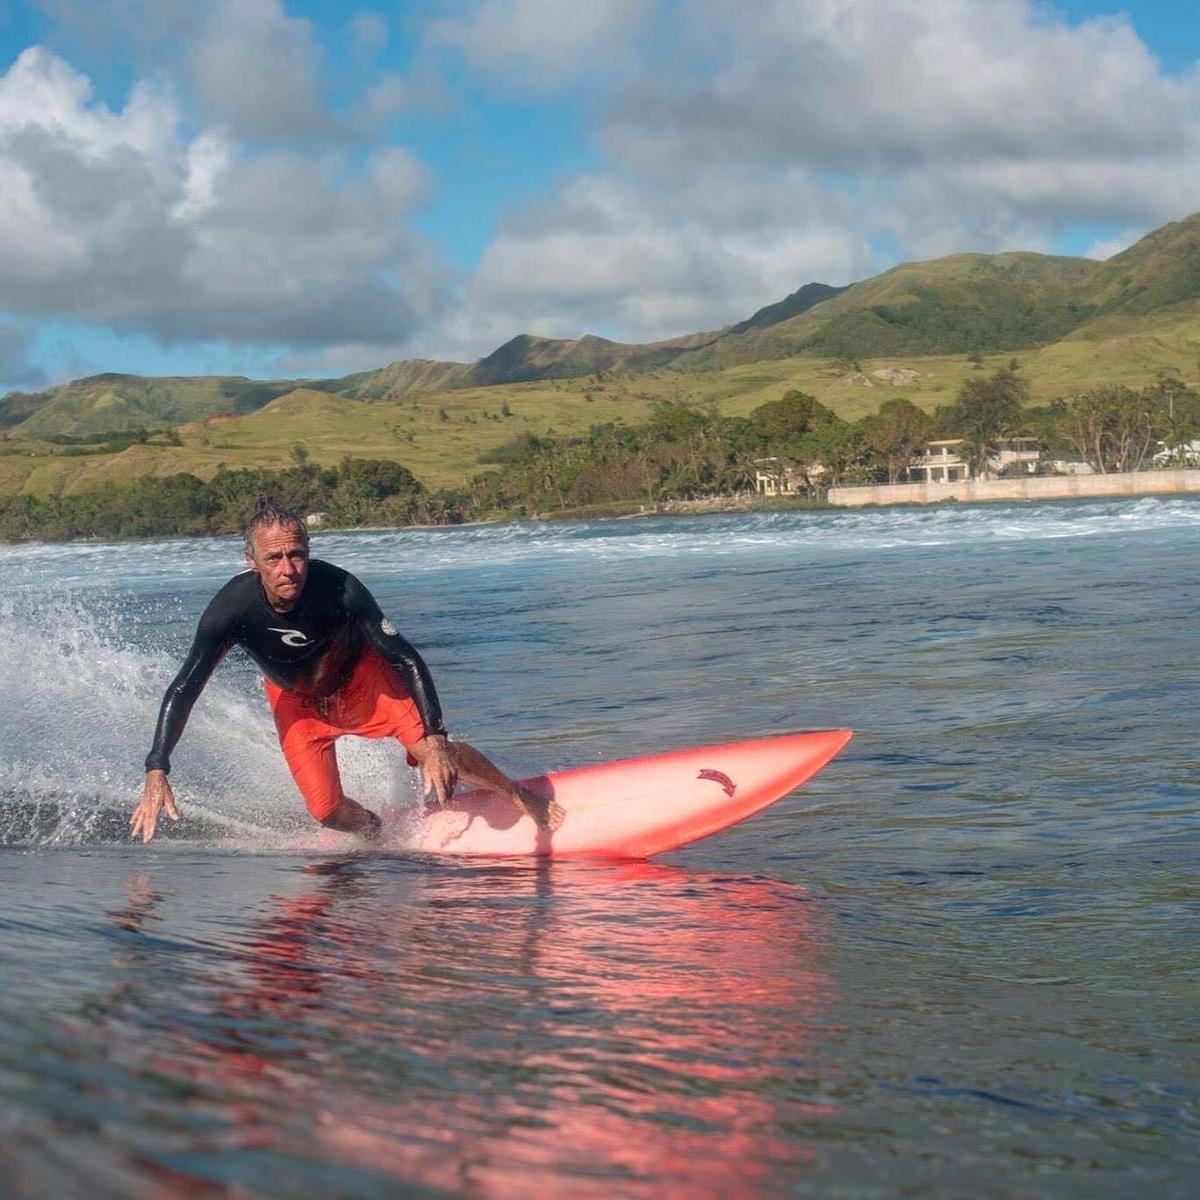 Surfing legend Kenneth Pier's memorial today